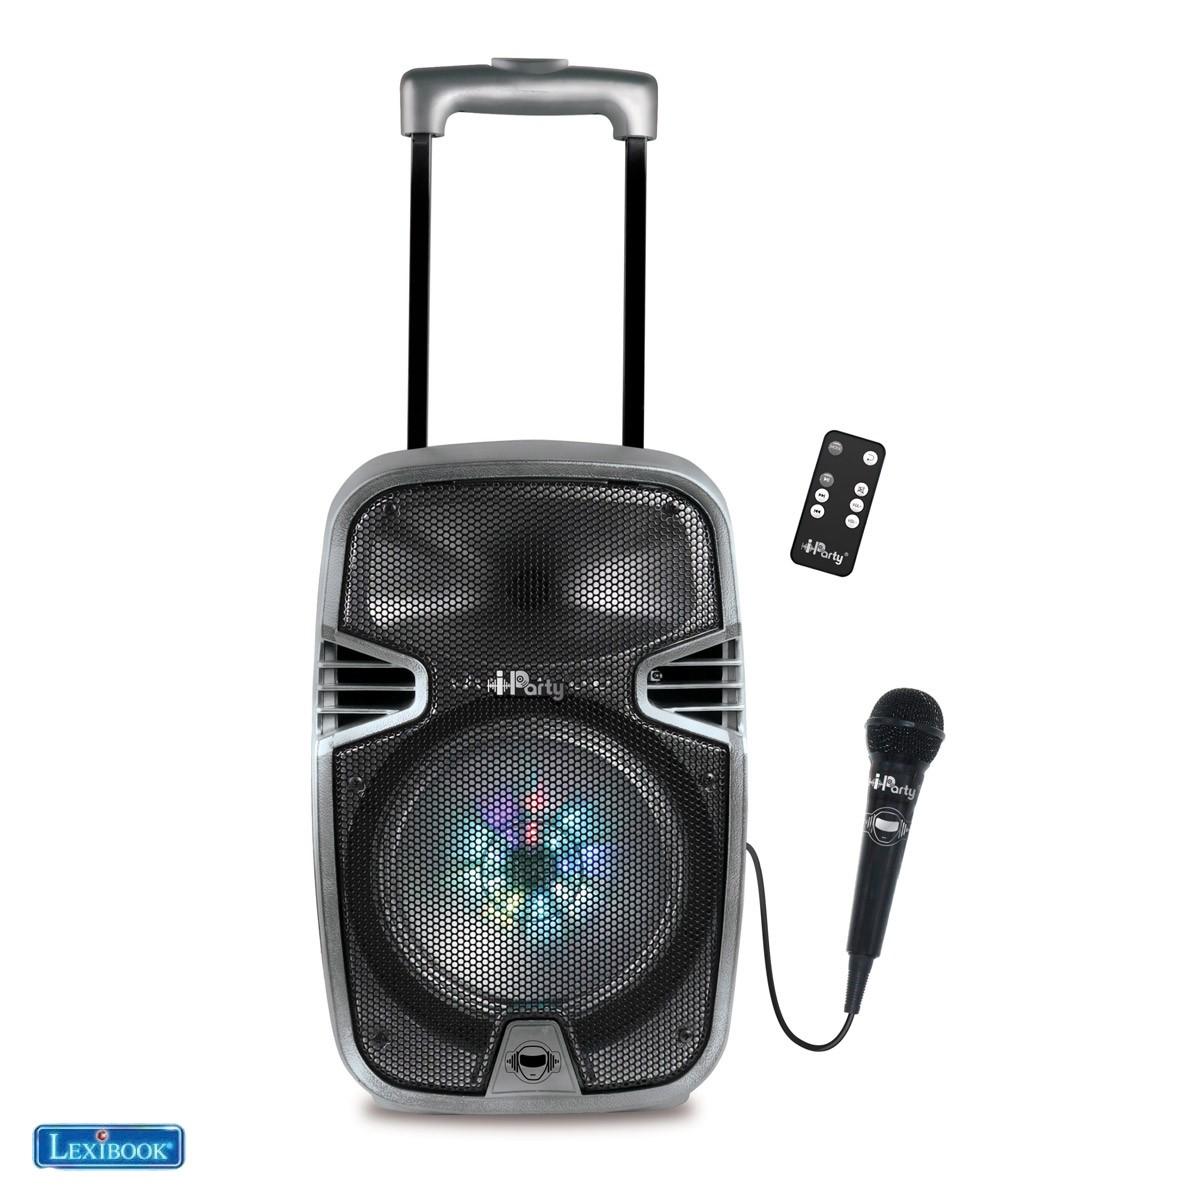 Lexibook iParty Bluetooth® Karaoke speaker - Lexibook K8250-02-00